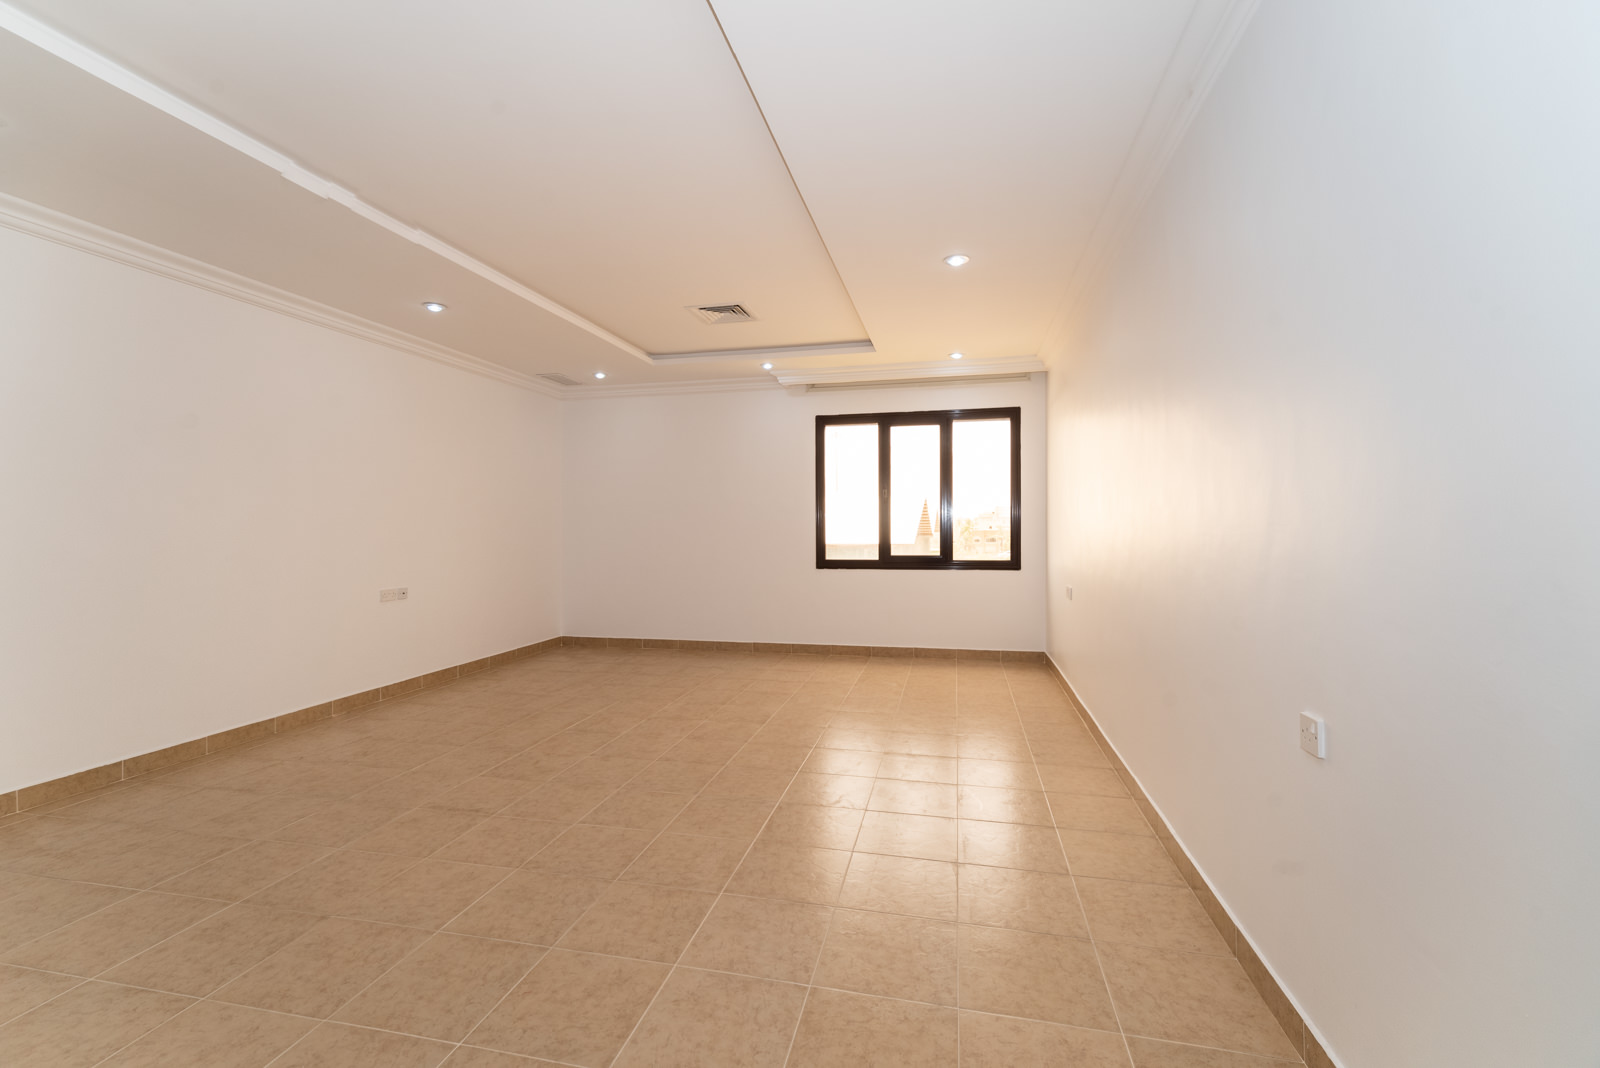 Salwa – unfurnished, four bedroom apartment